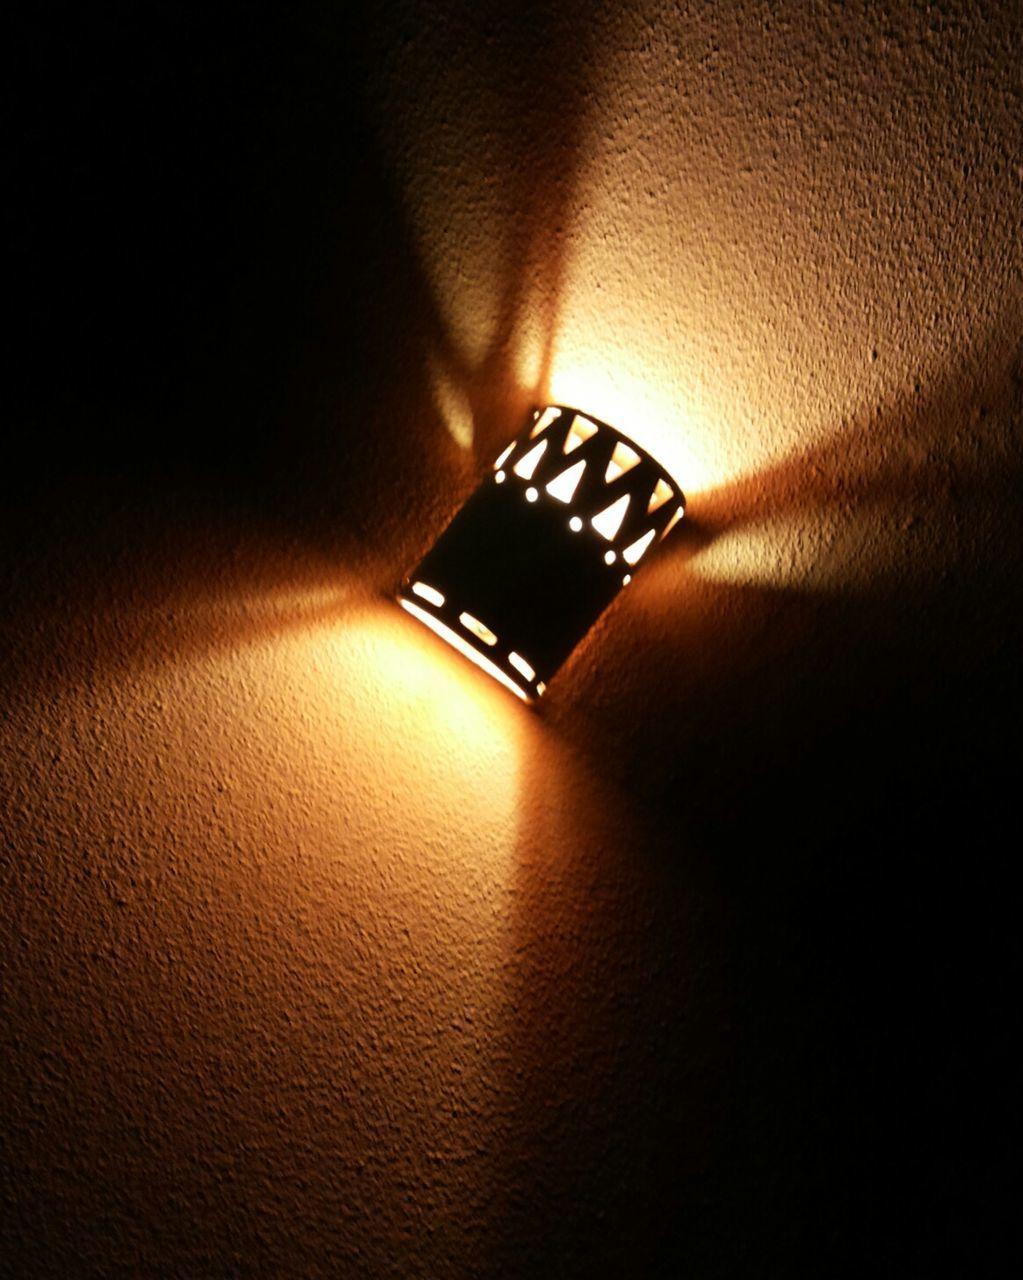 illuminated, indoors, no people, shadow, lighting equipment, electricity, night, technology, close-up